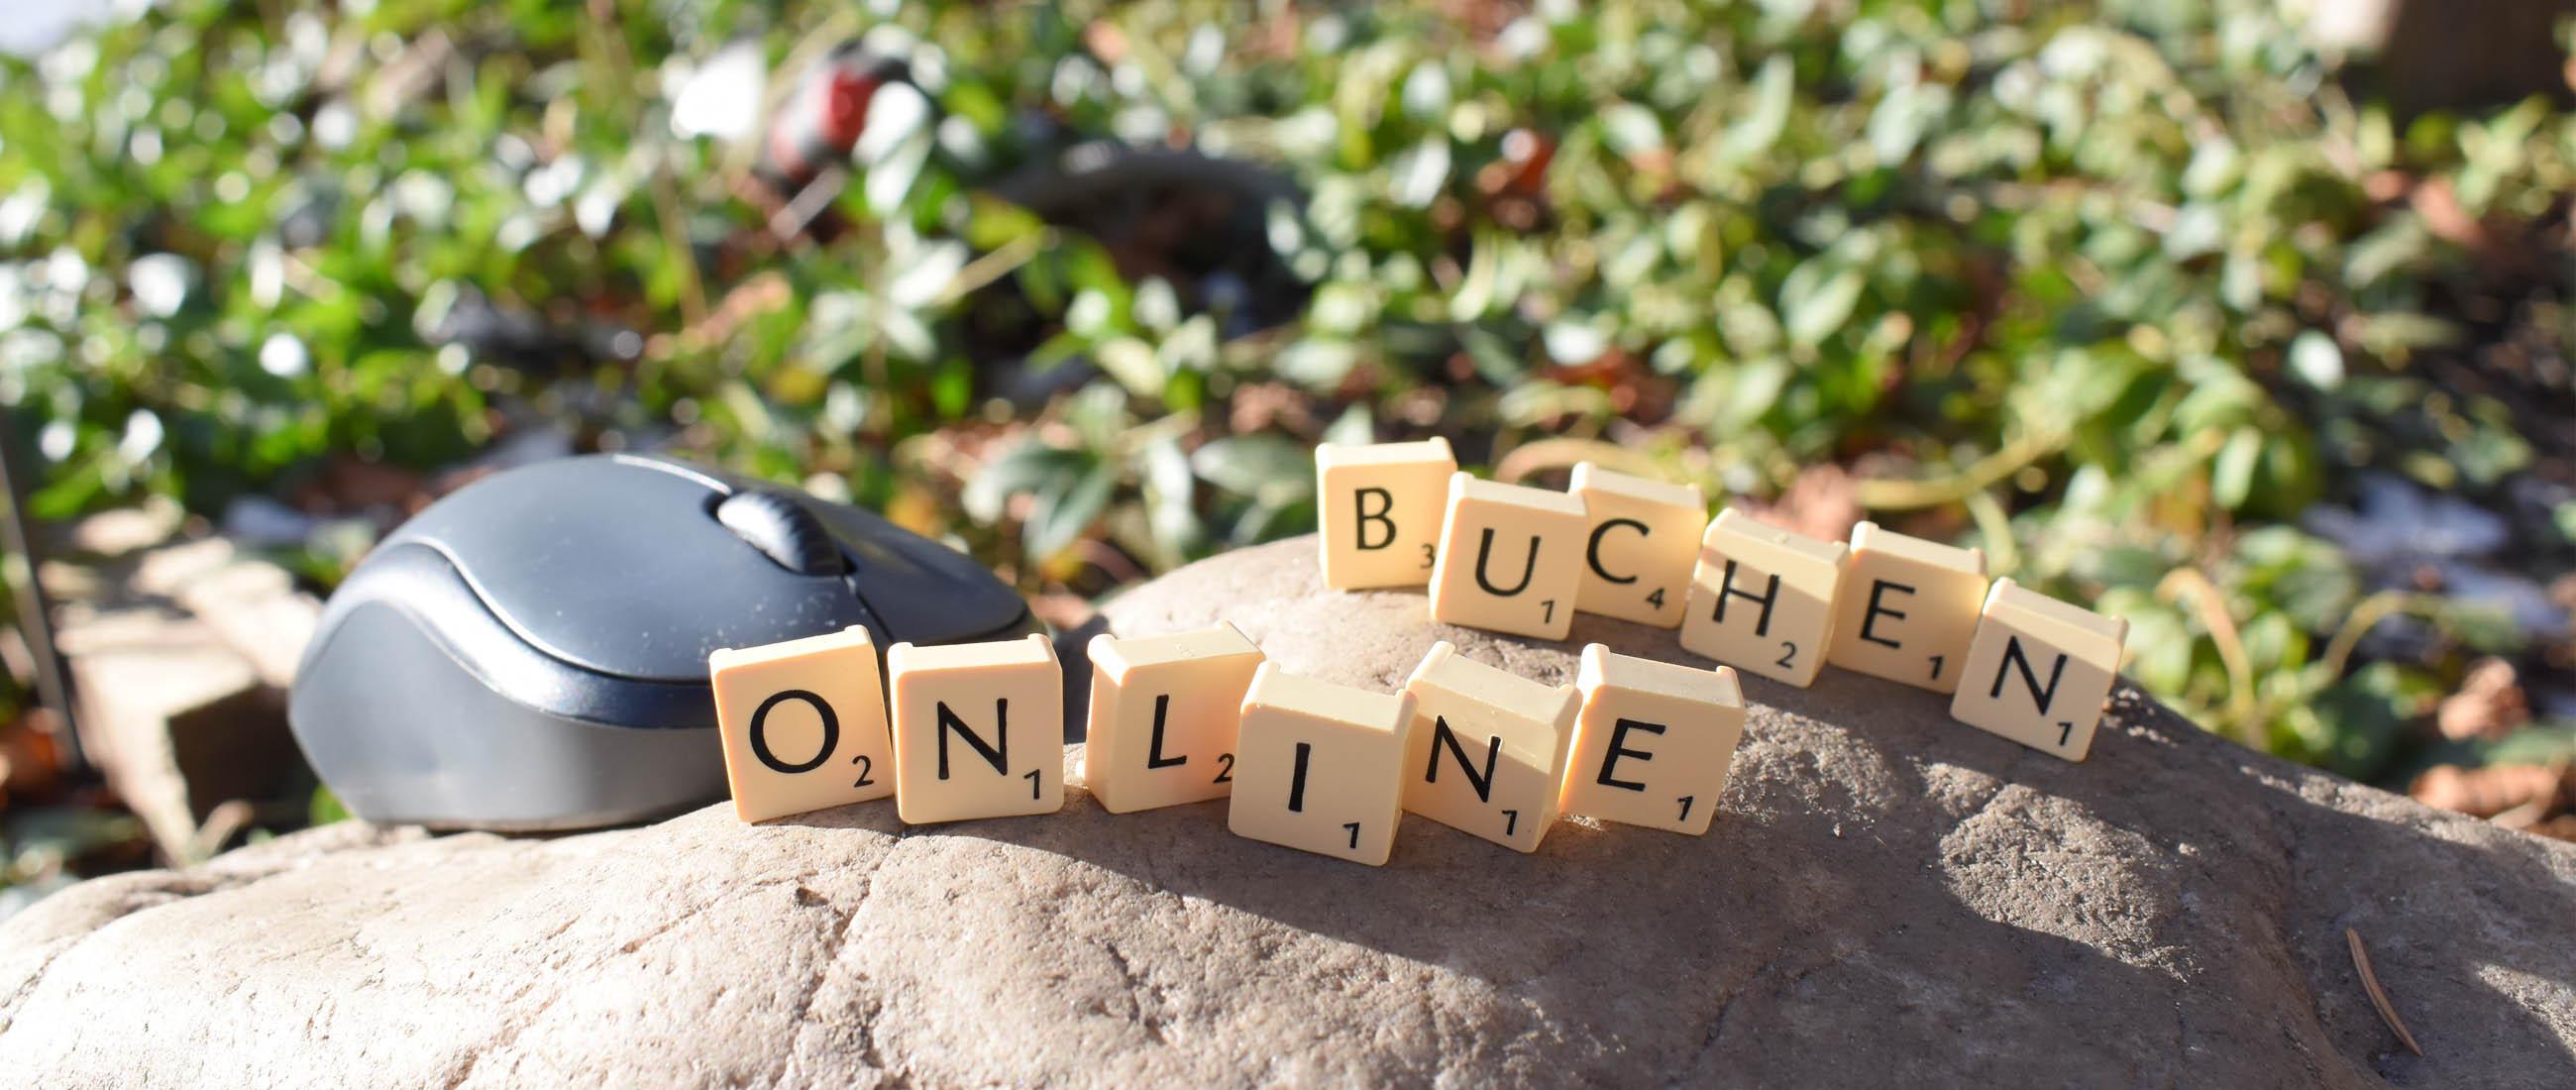 Onlinebuchbar_Kloepferkeller